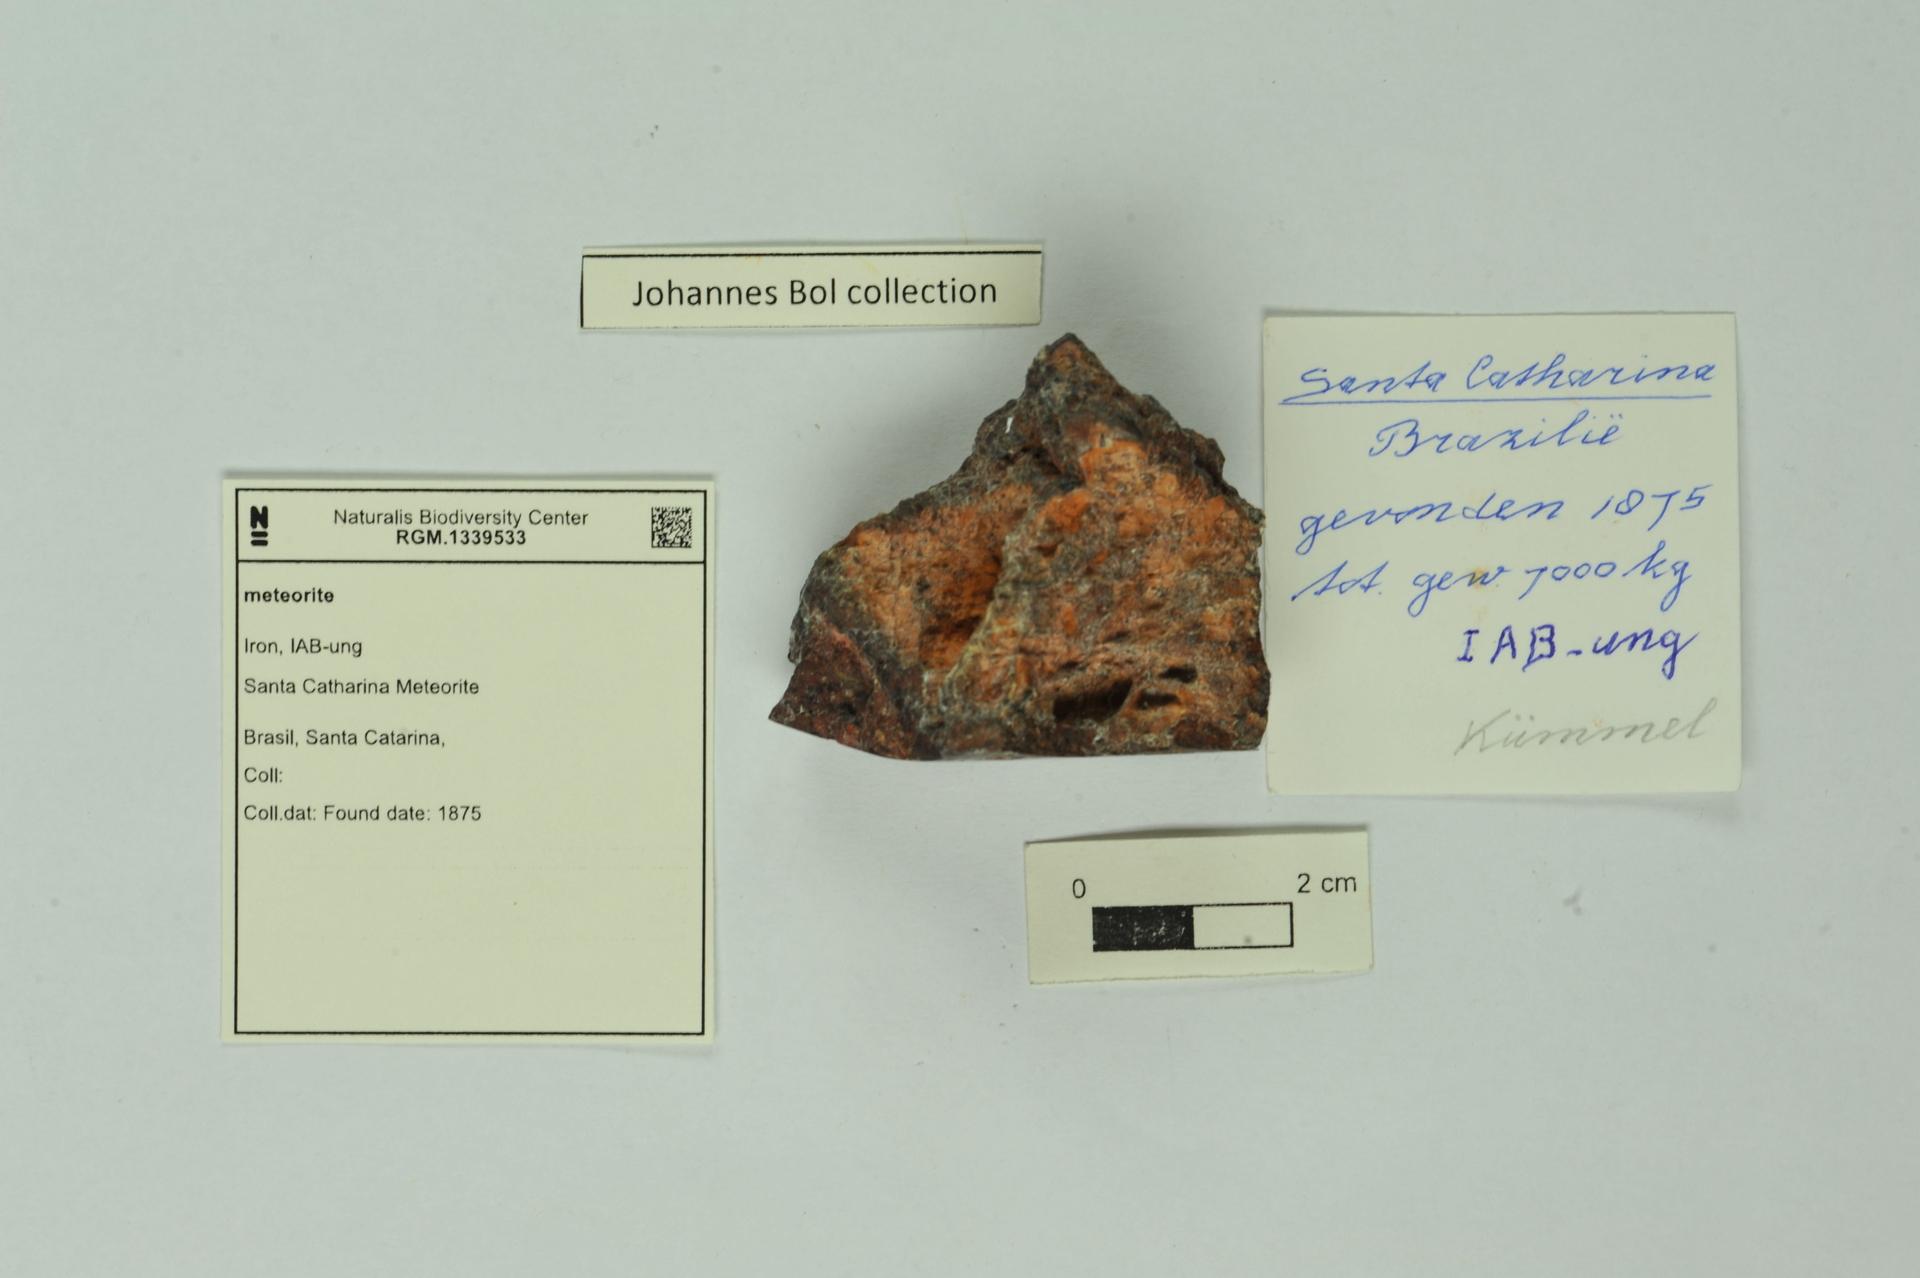 RGM.1339533 | Iron, IAB-ung